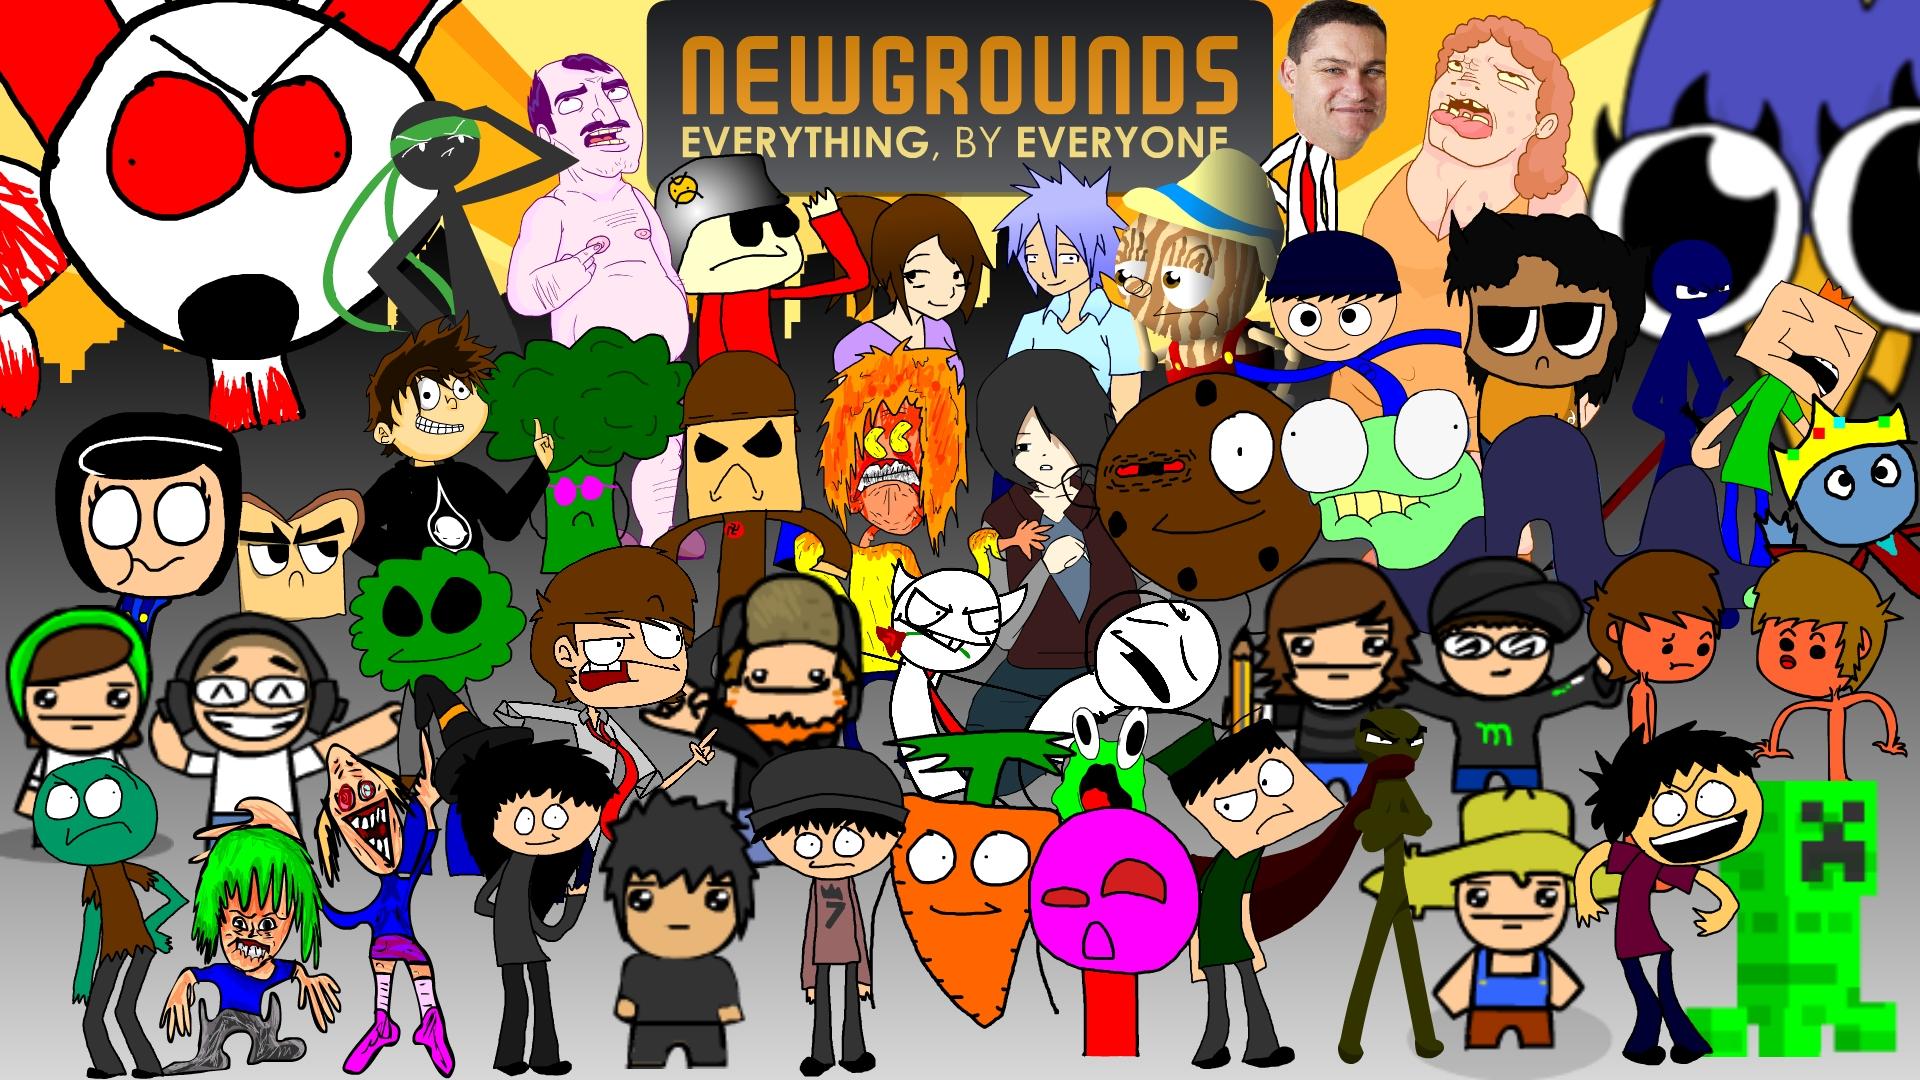 Amazing Newgrounds Poster!